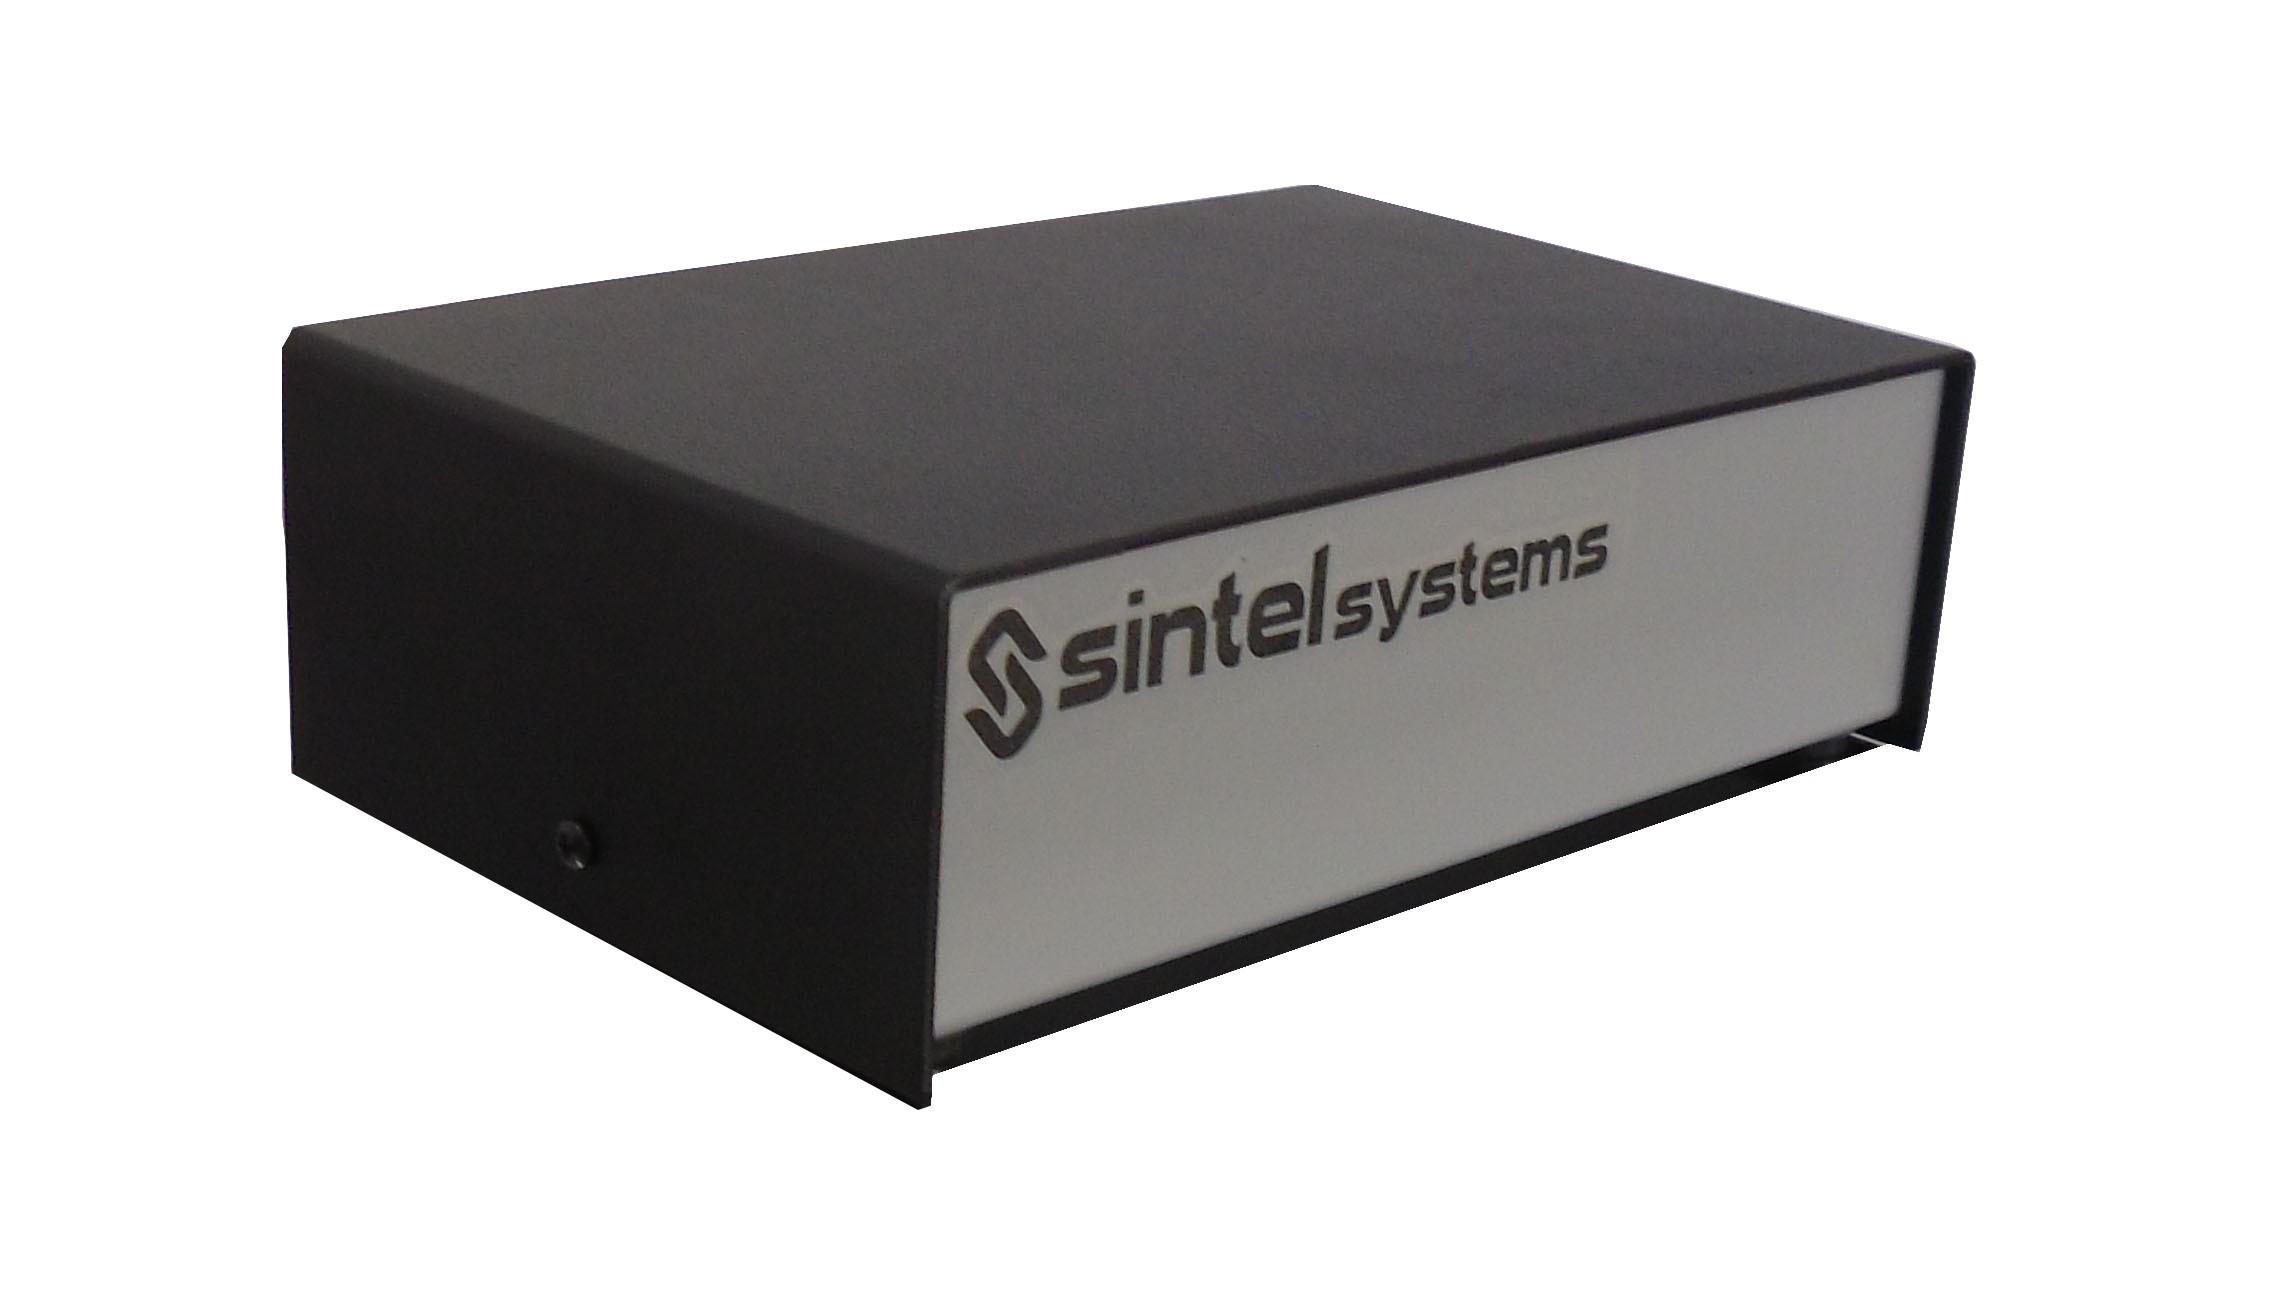 Sintelsystemspos.com_Text_Overlay_Box